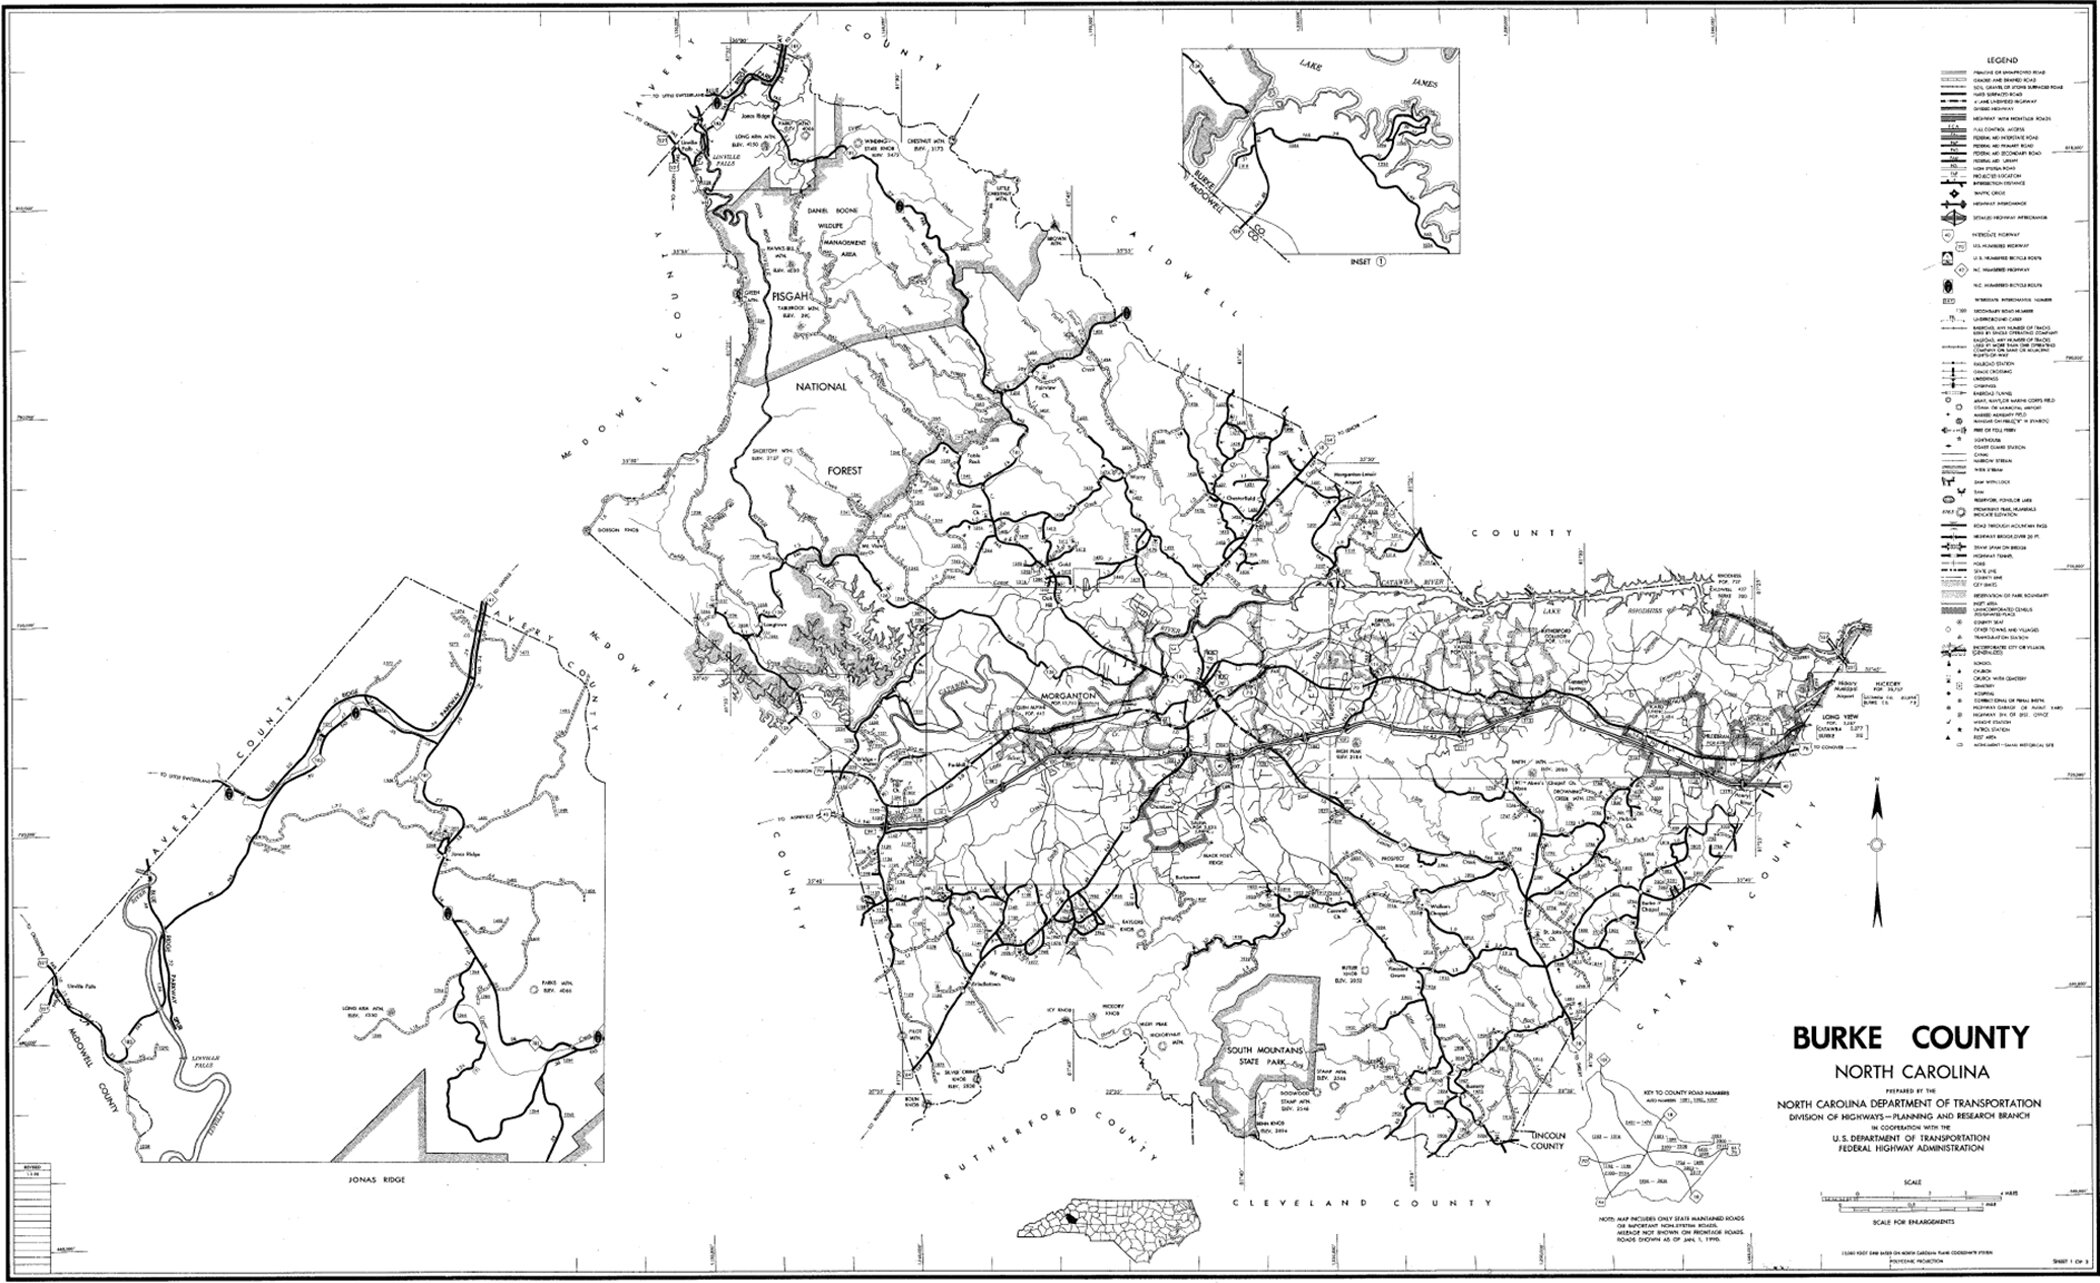 Burke_County_Road_Map_1990.jpg